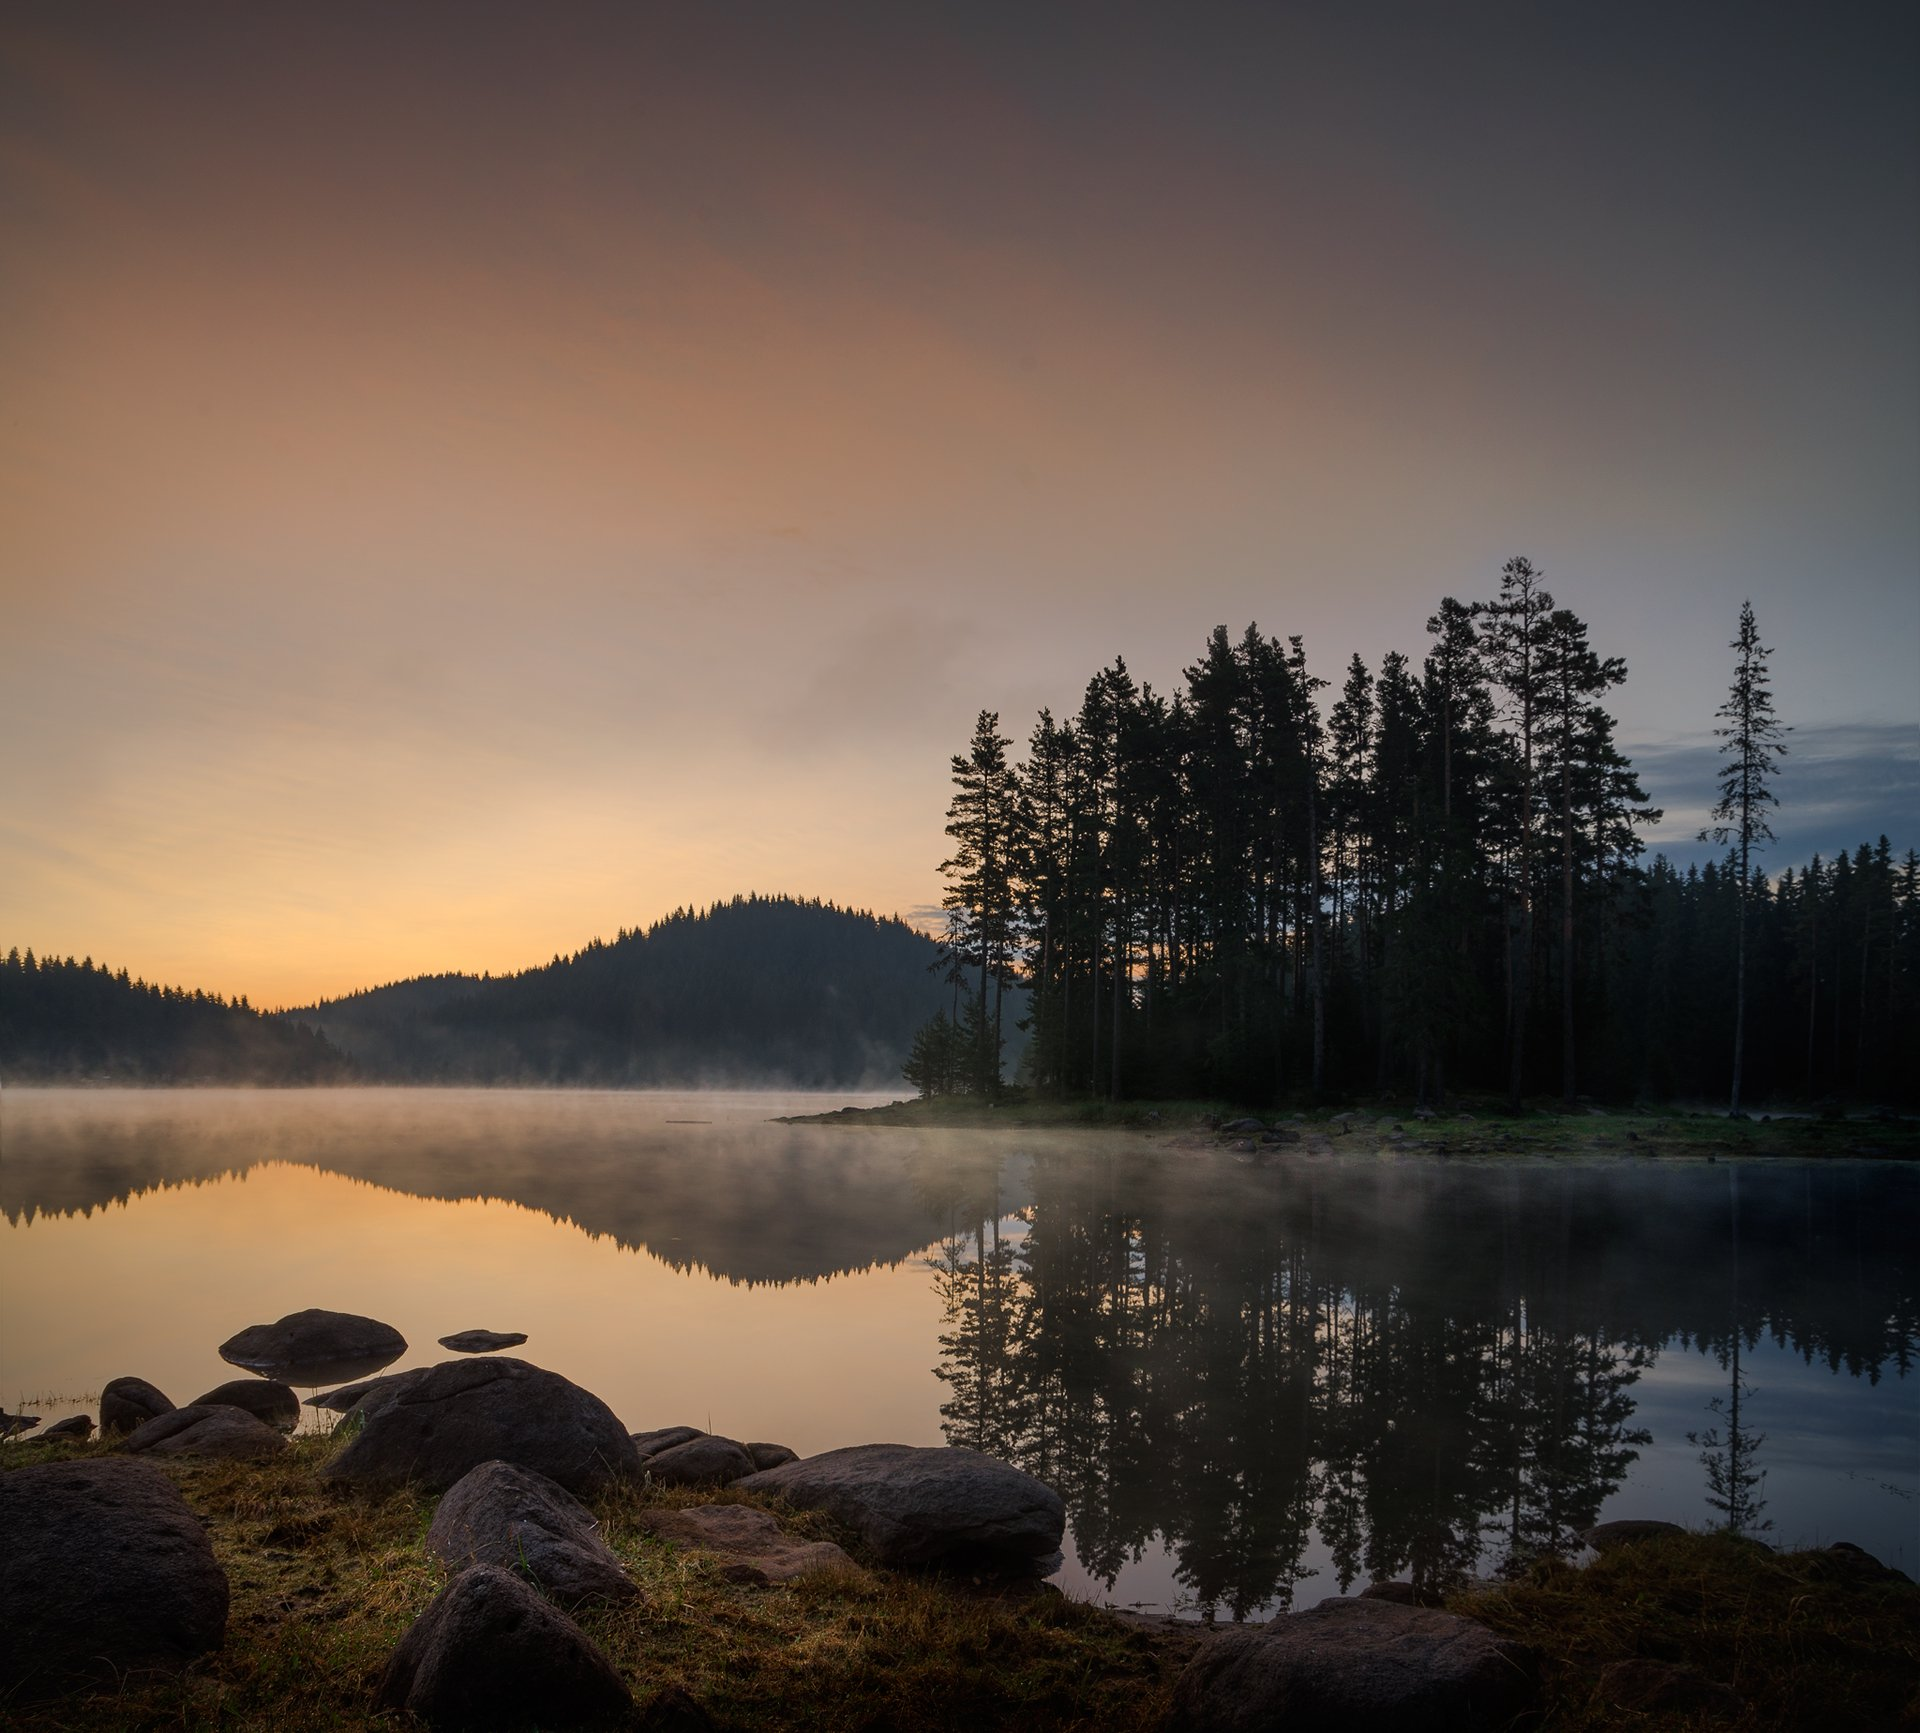 landscape, nature, sunrise, morning, утро, пейзаж, озеро, rocks, coastal, coast, beach, lake, long, exposure, scenery, reflections, Александър Александров